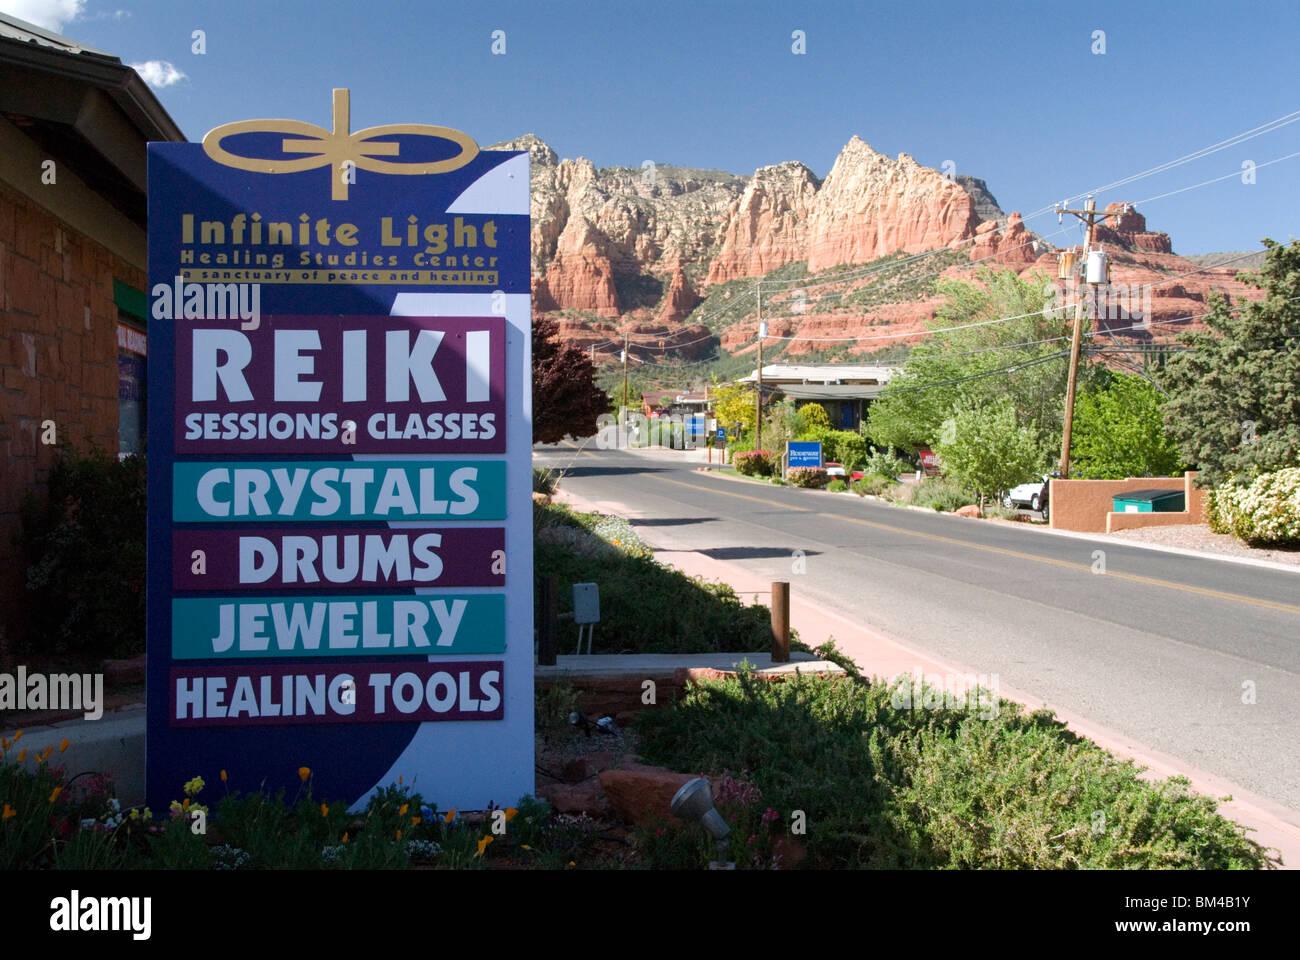 Infinite Light Healing Centre Reiki Crystals Jewelery sign in city of Sedona Arizona USA - Stock Image